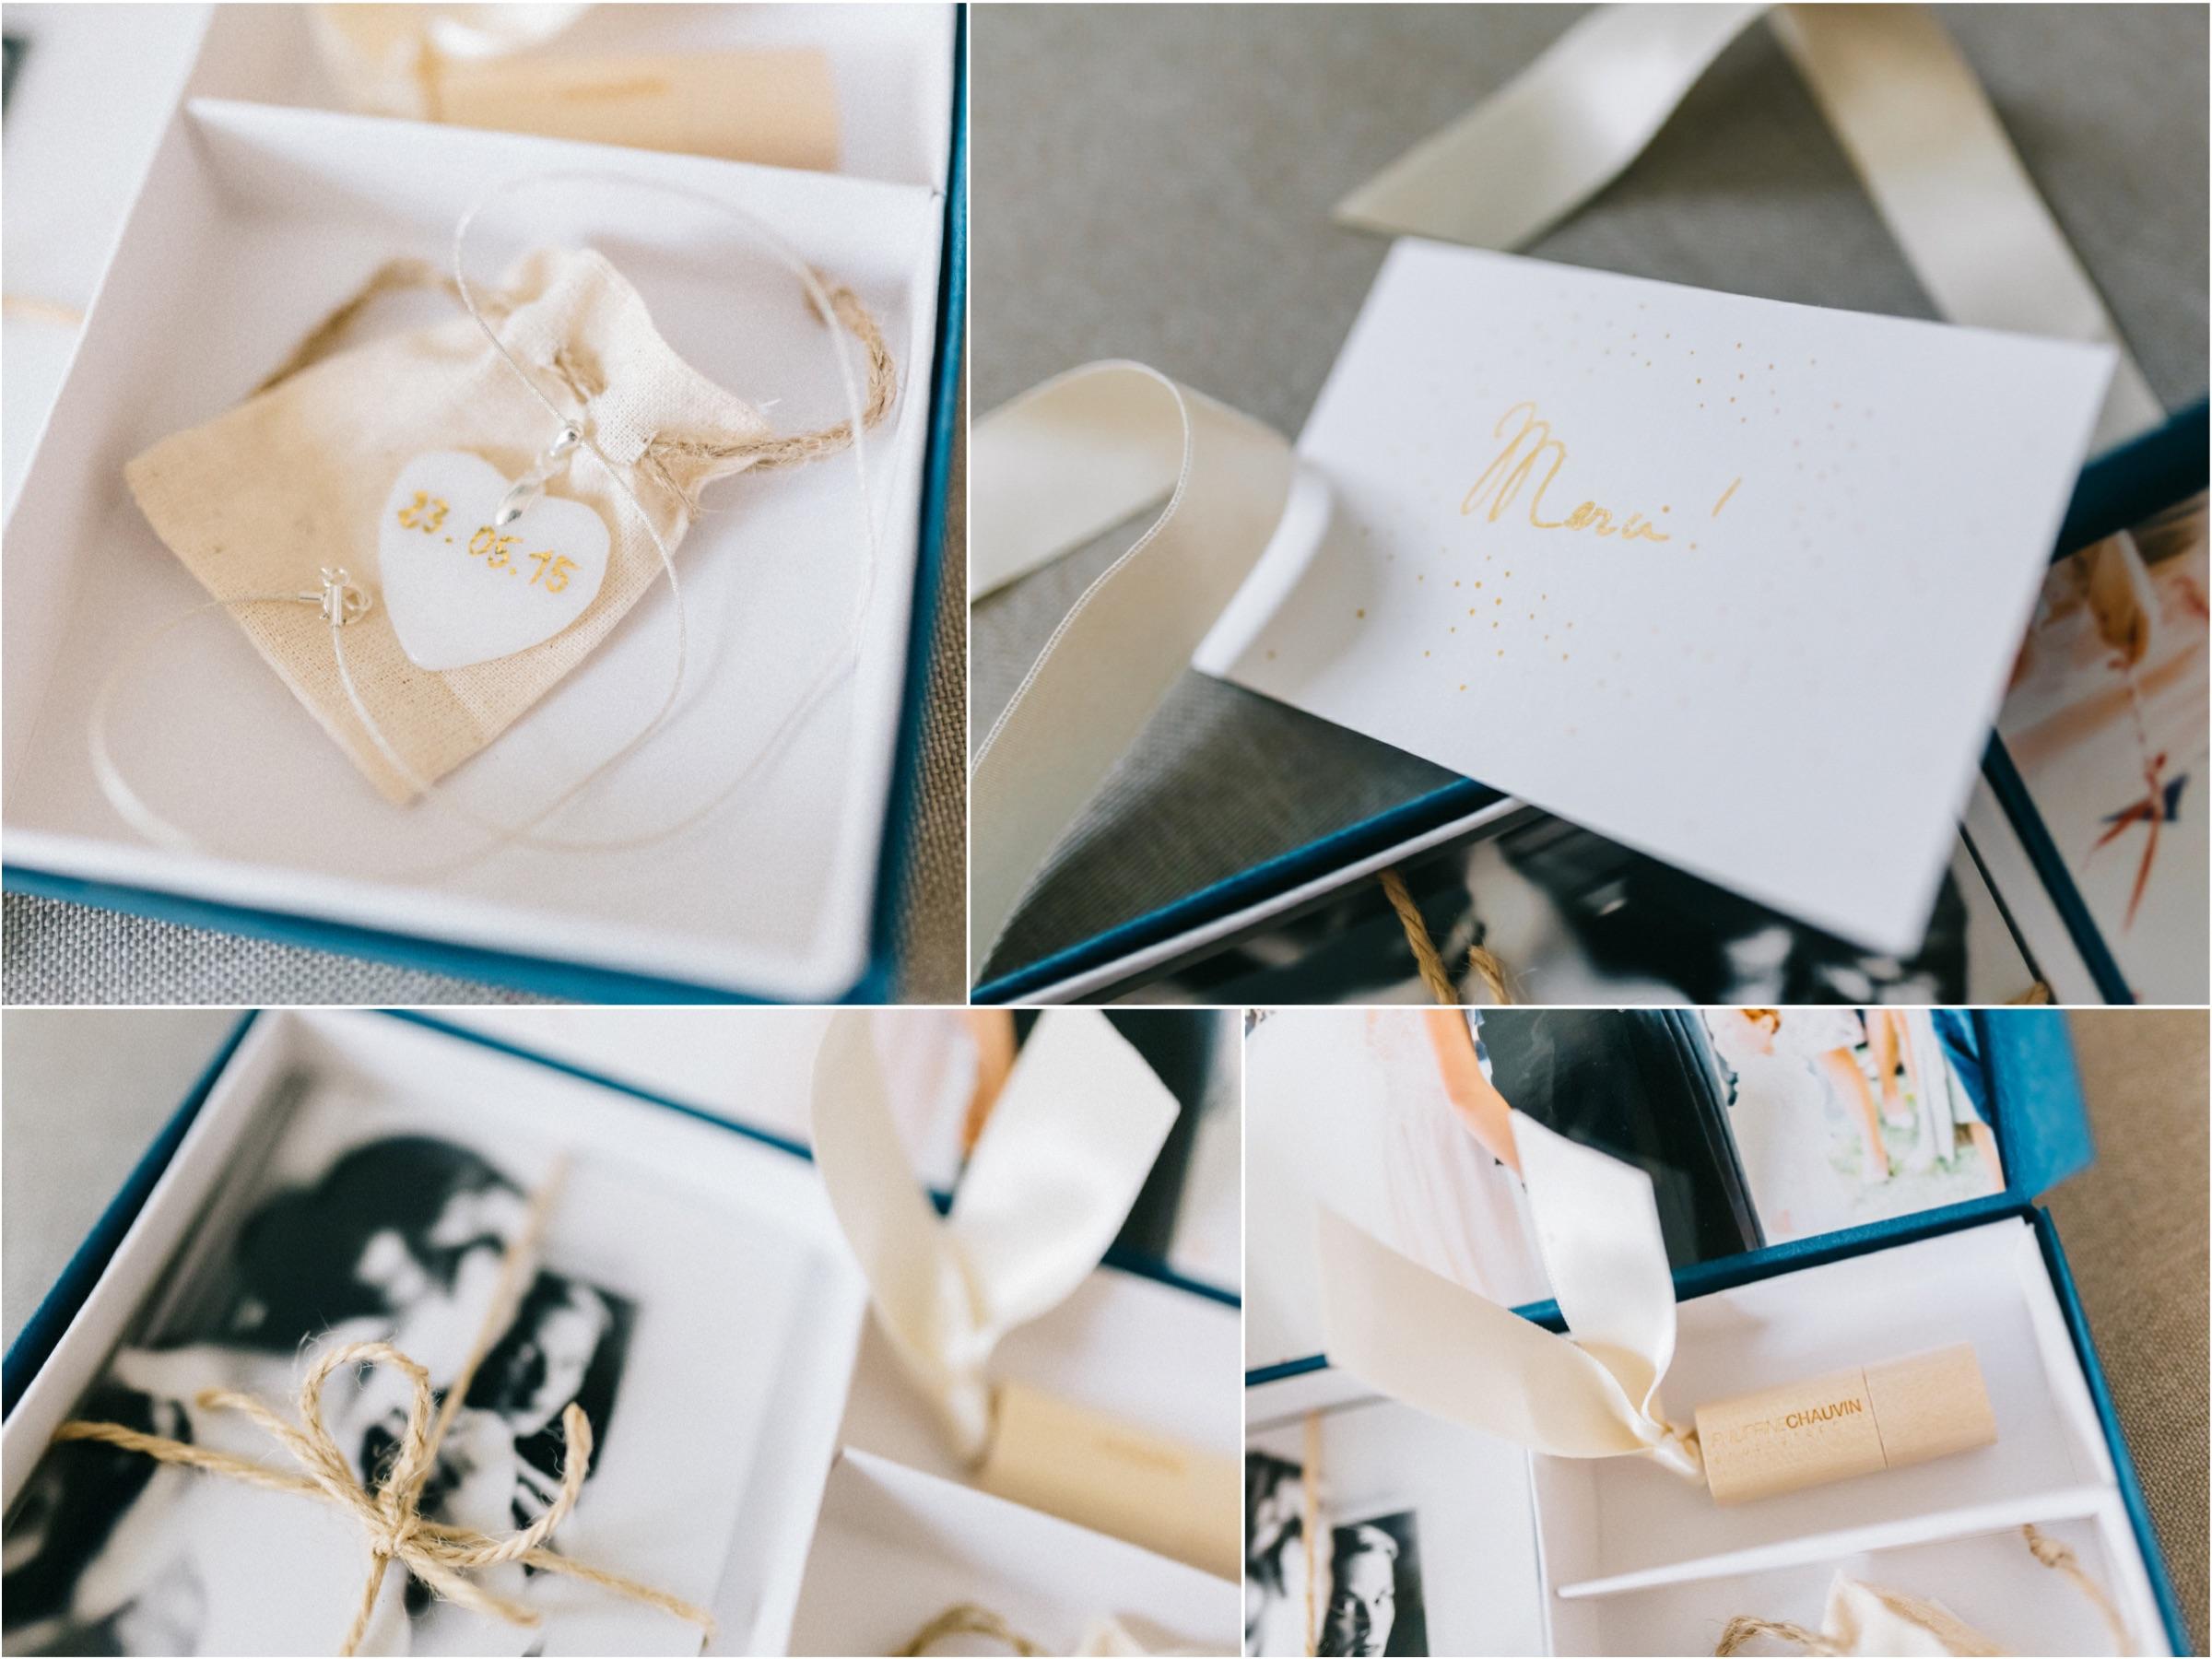 packaging mariage photographe.jpg